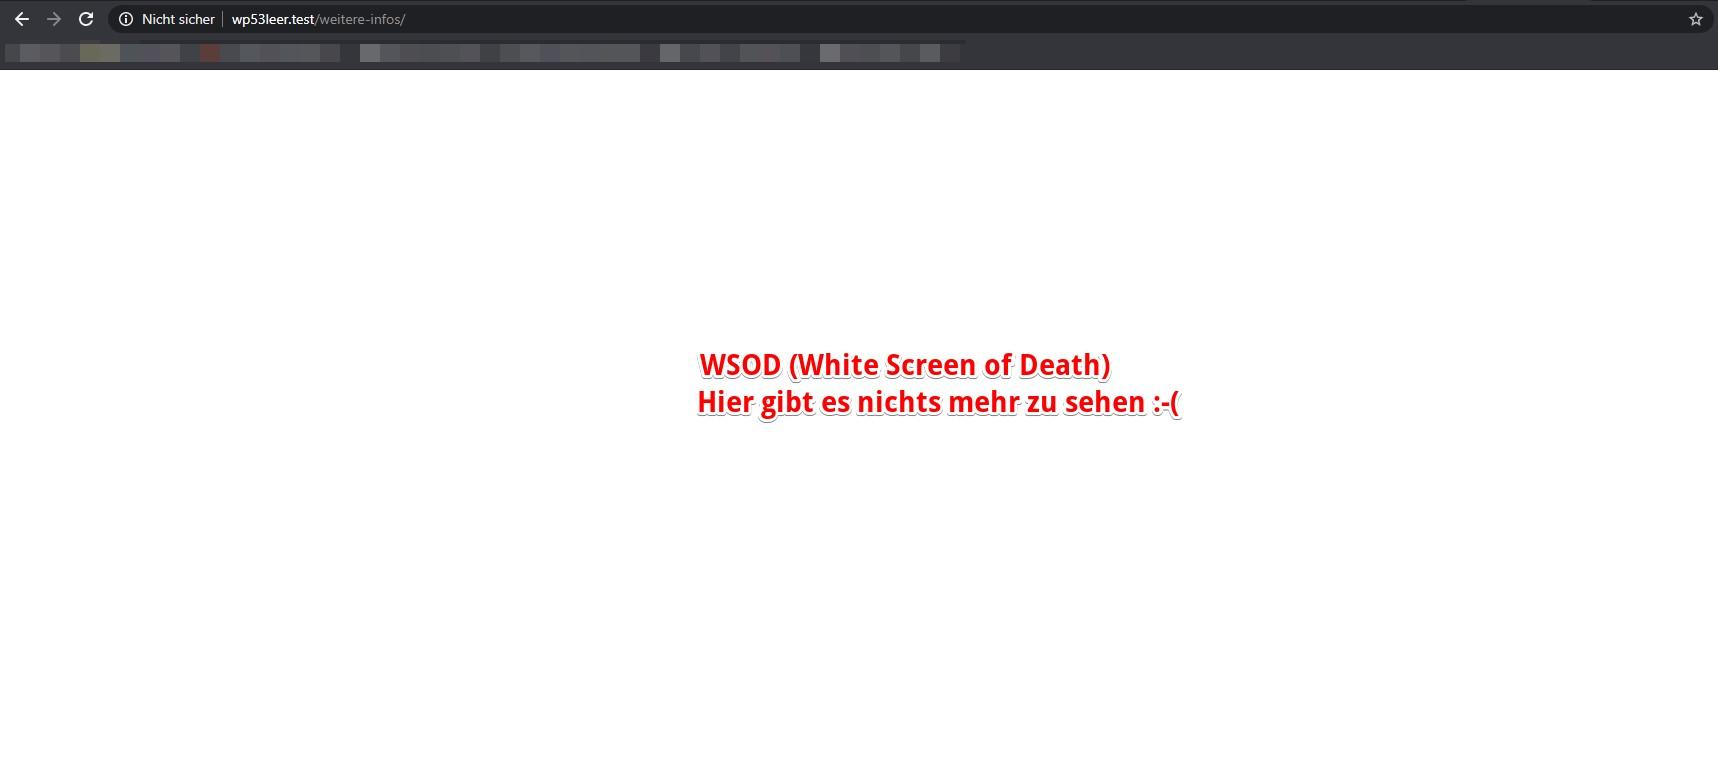 WSOD White Screen of Death